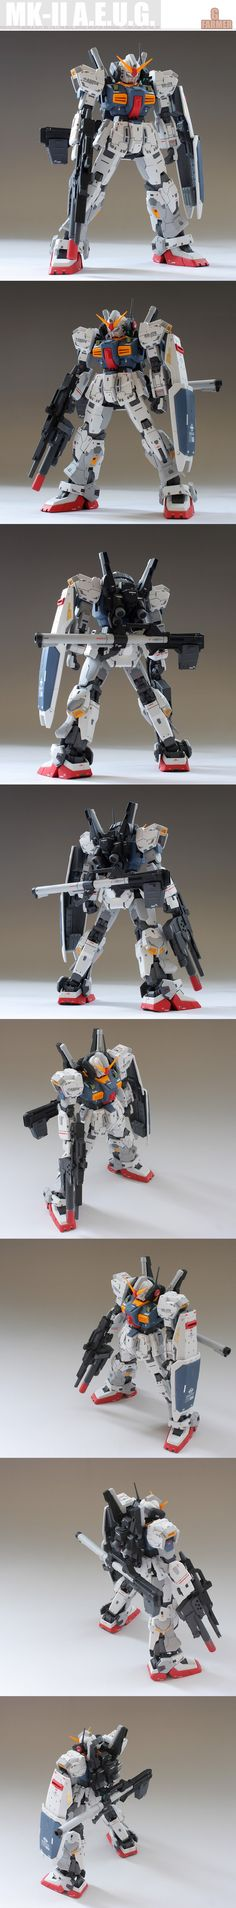 RG 1/144 Gundam Mk-II